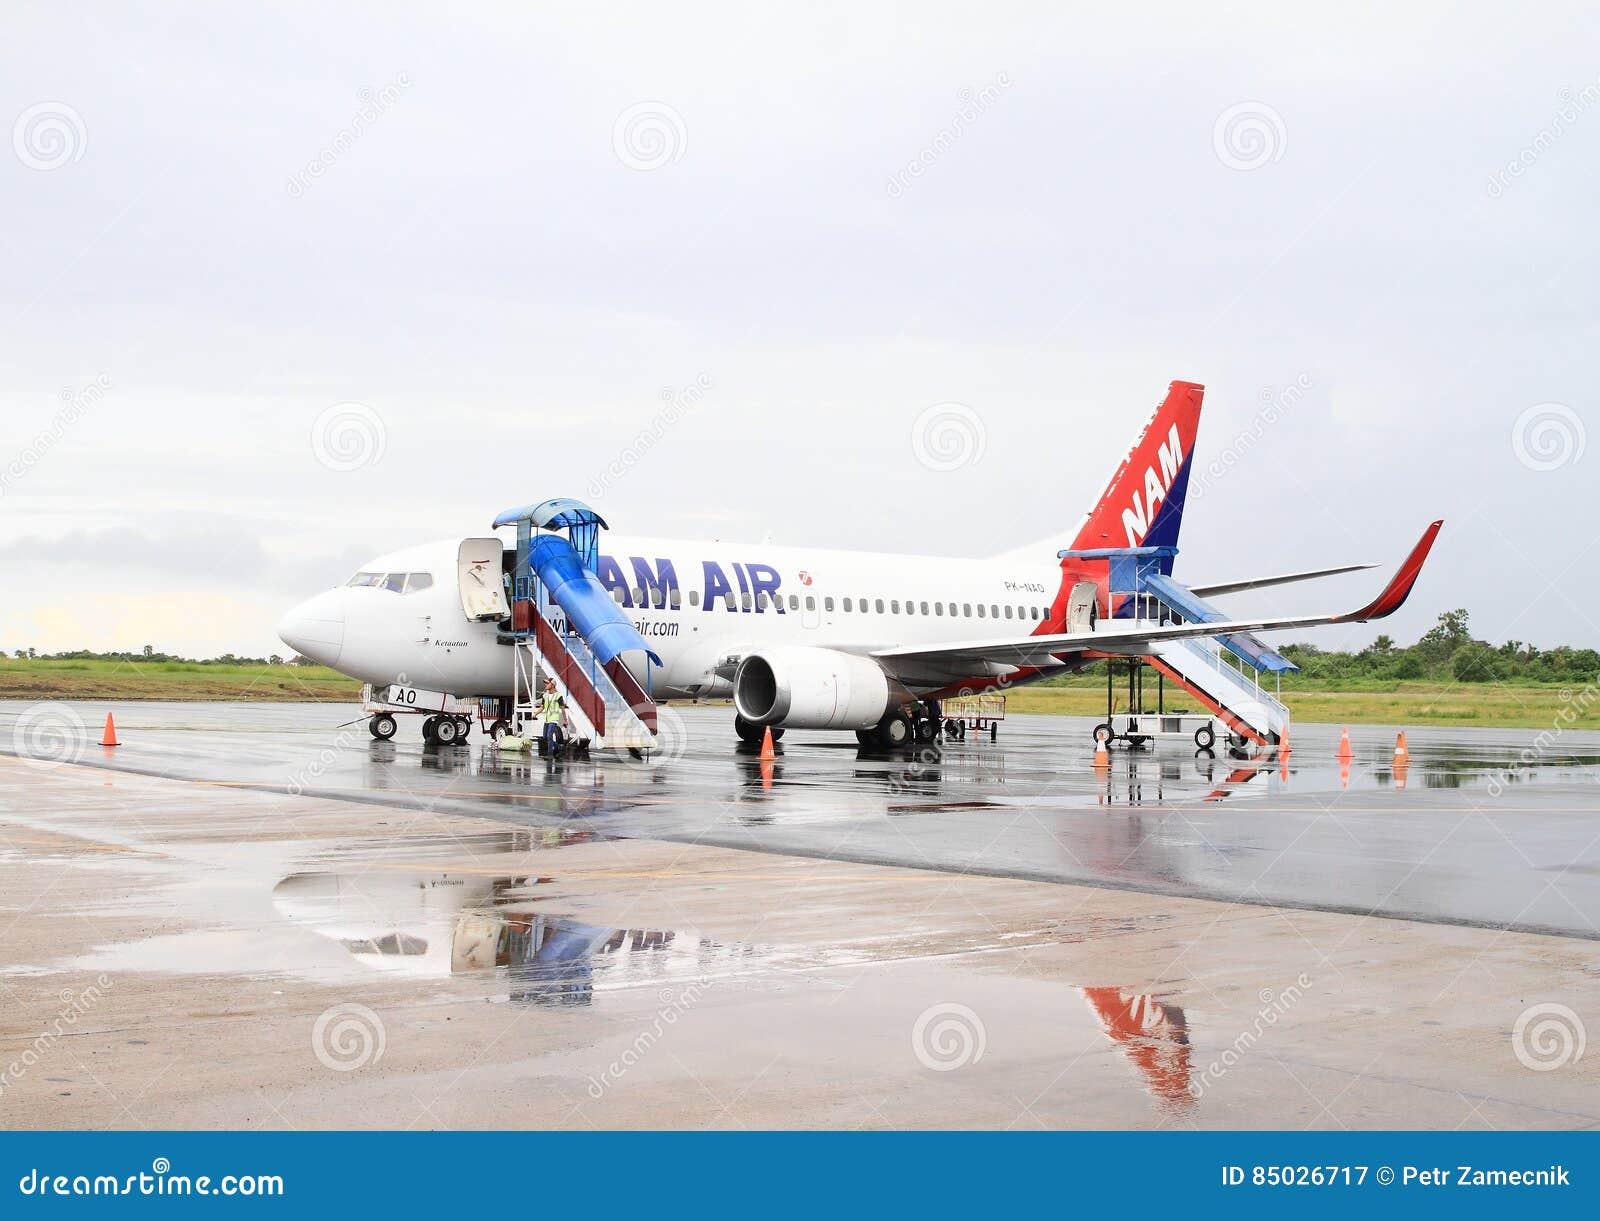 Airplane Nam Air on airport